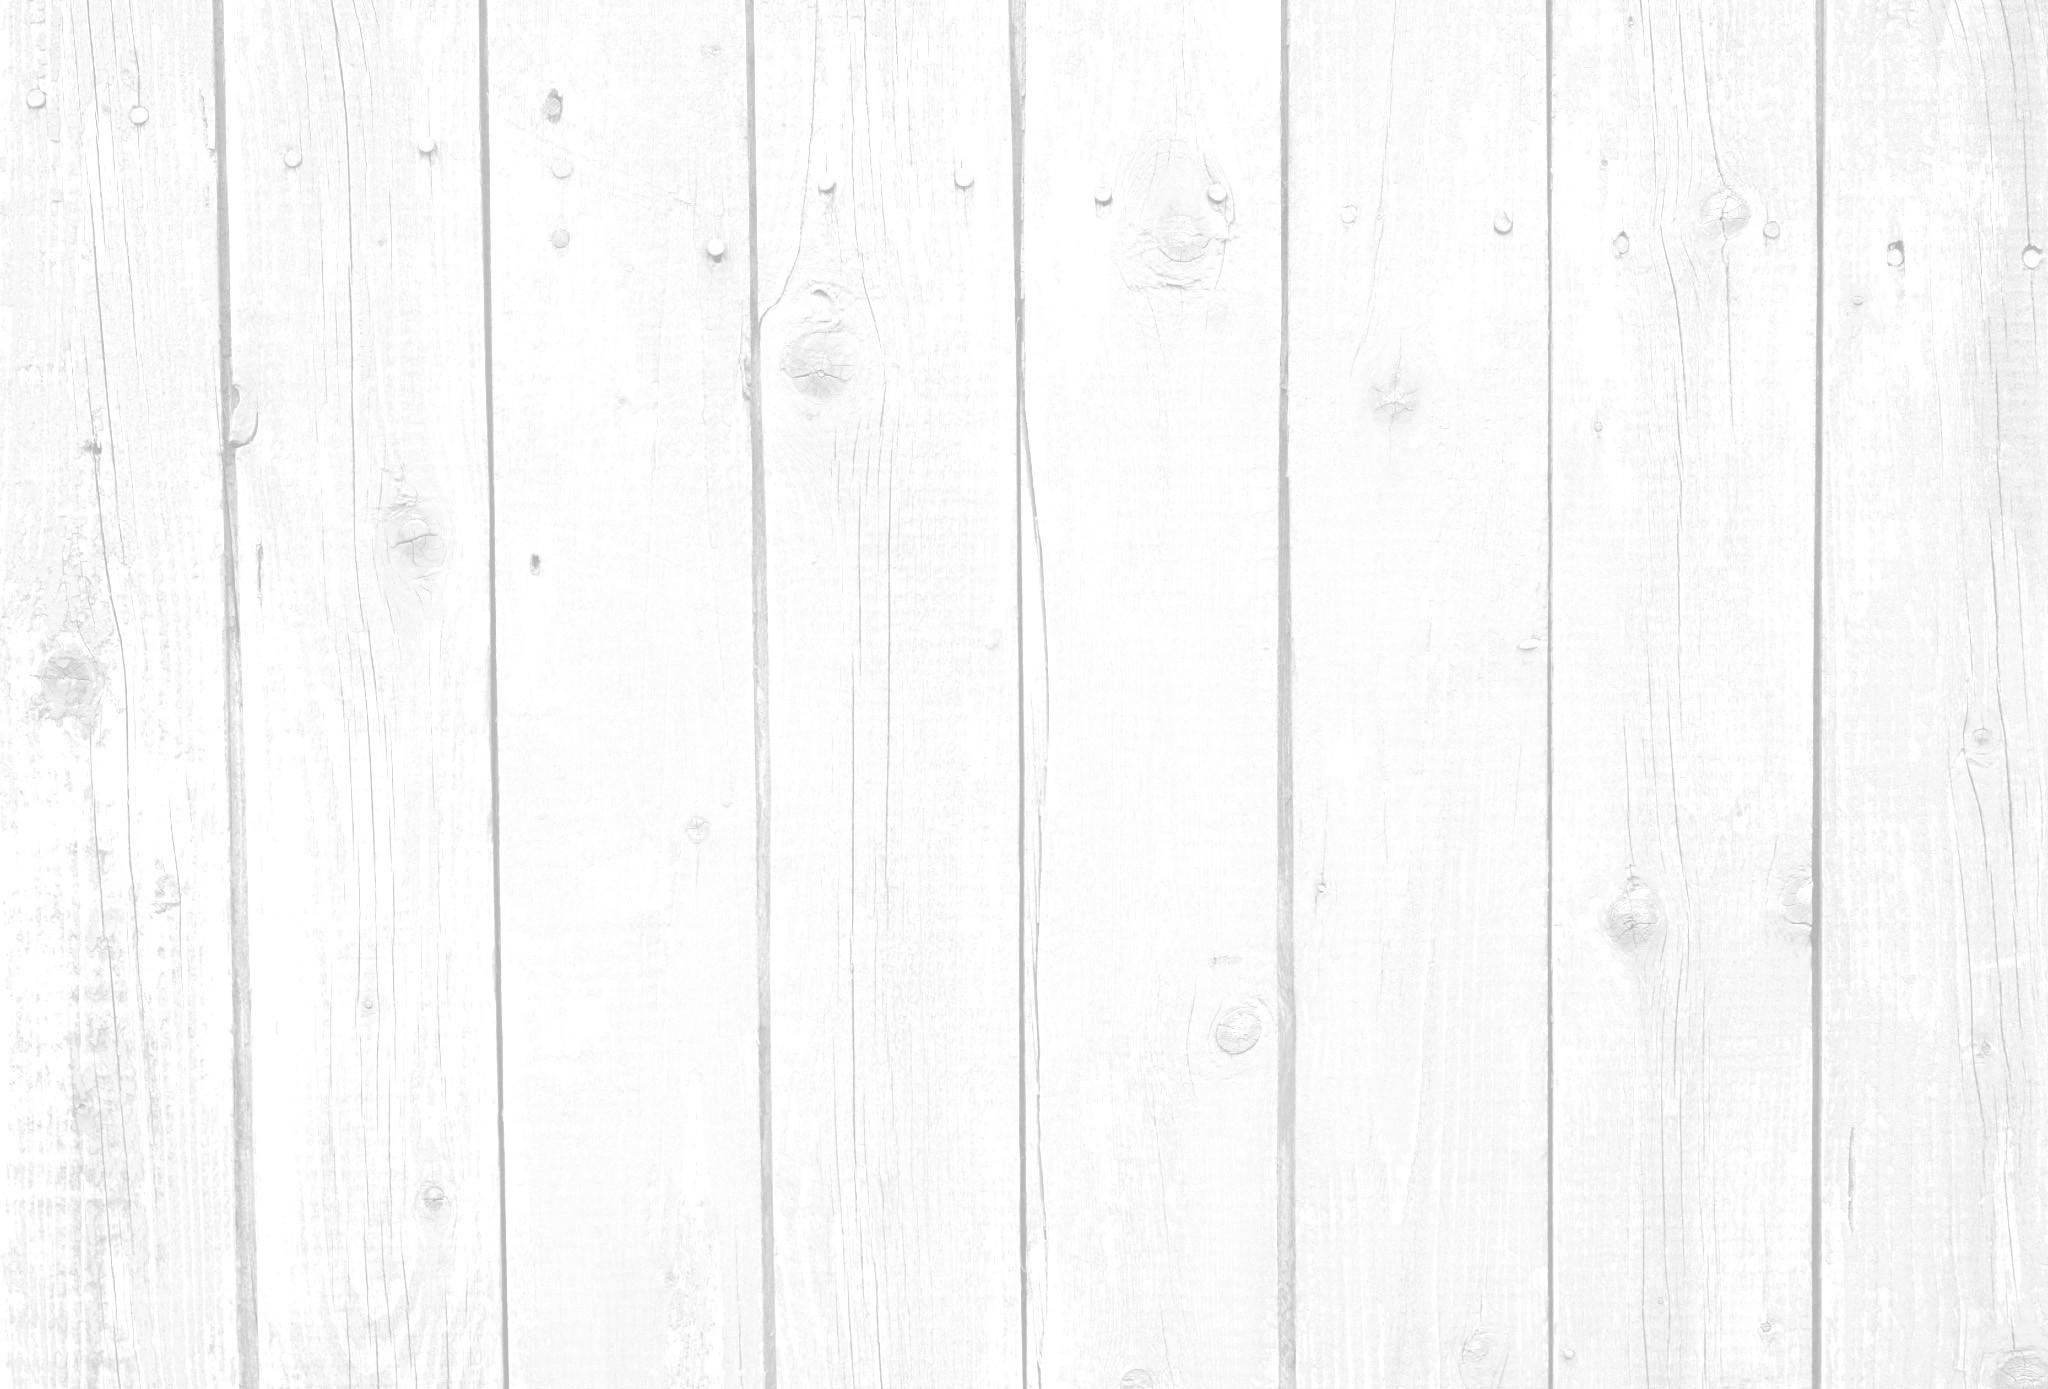 white wood background  u00b7 u2460 download free beautiful high resolution wallpapers for desktop